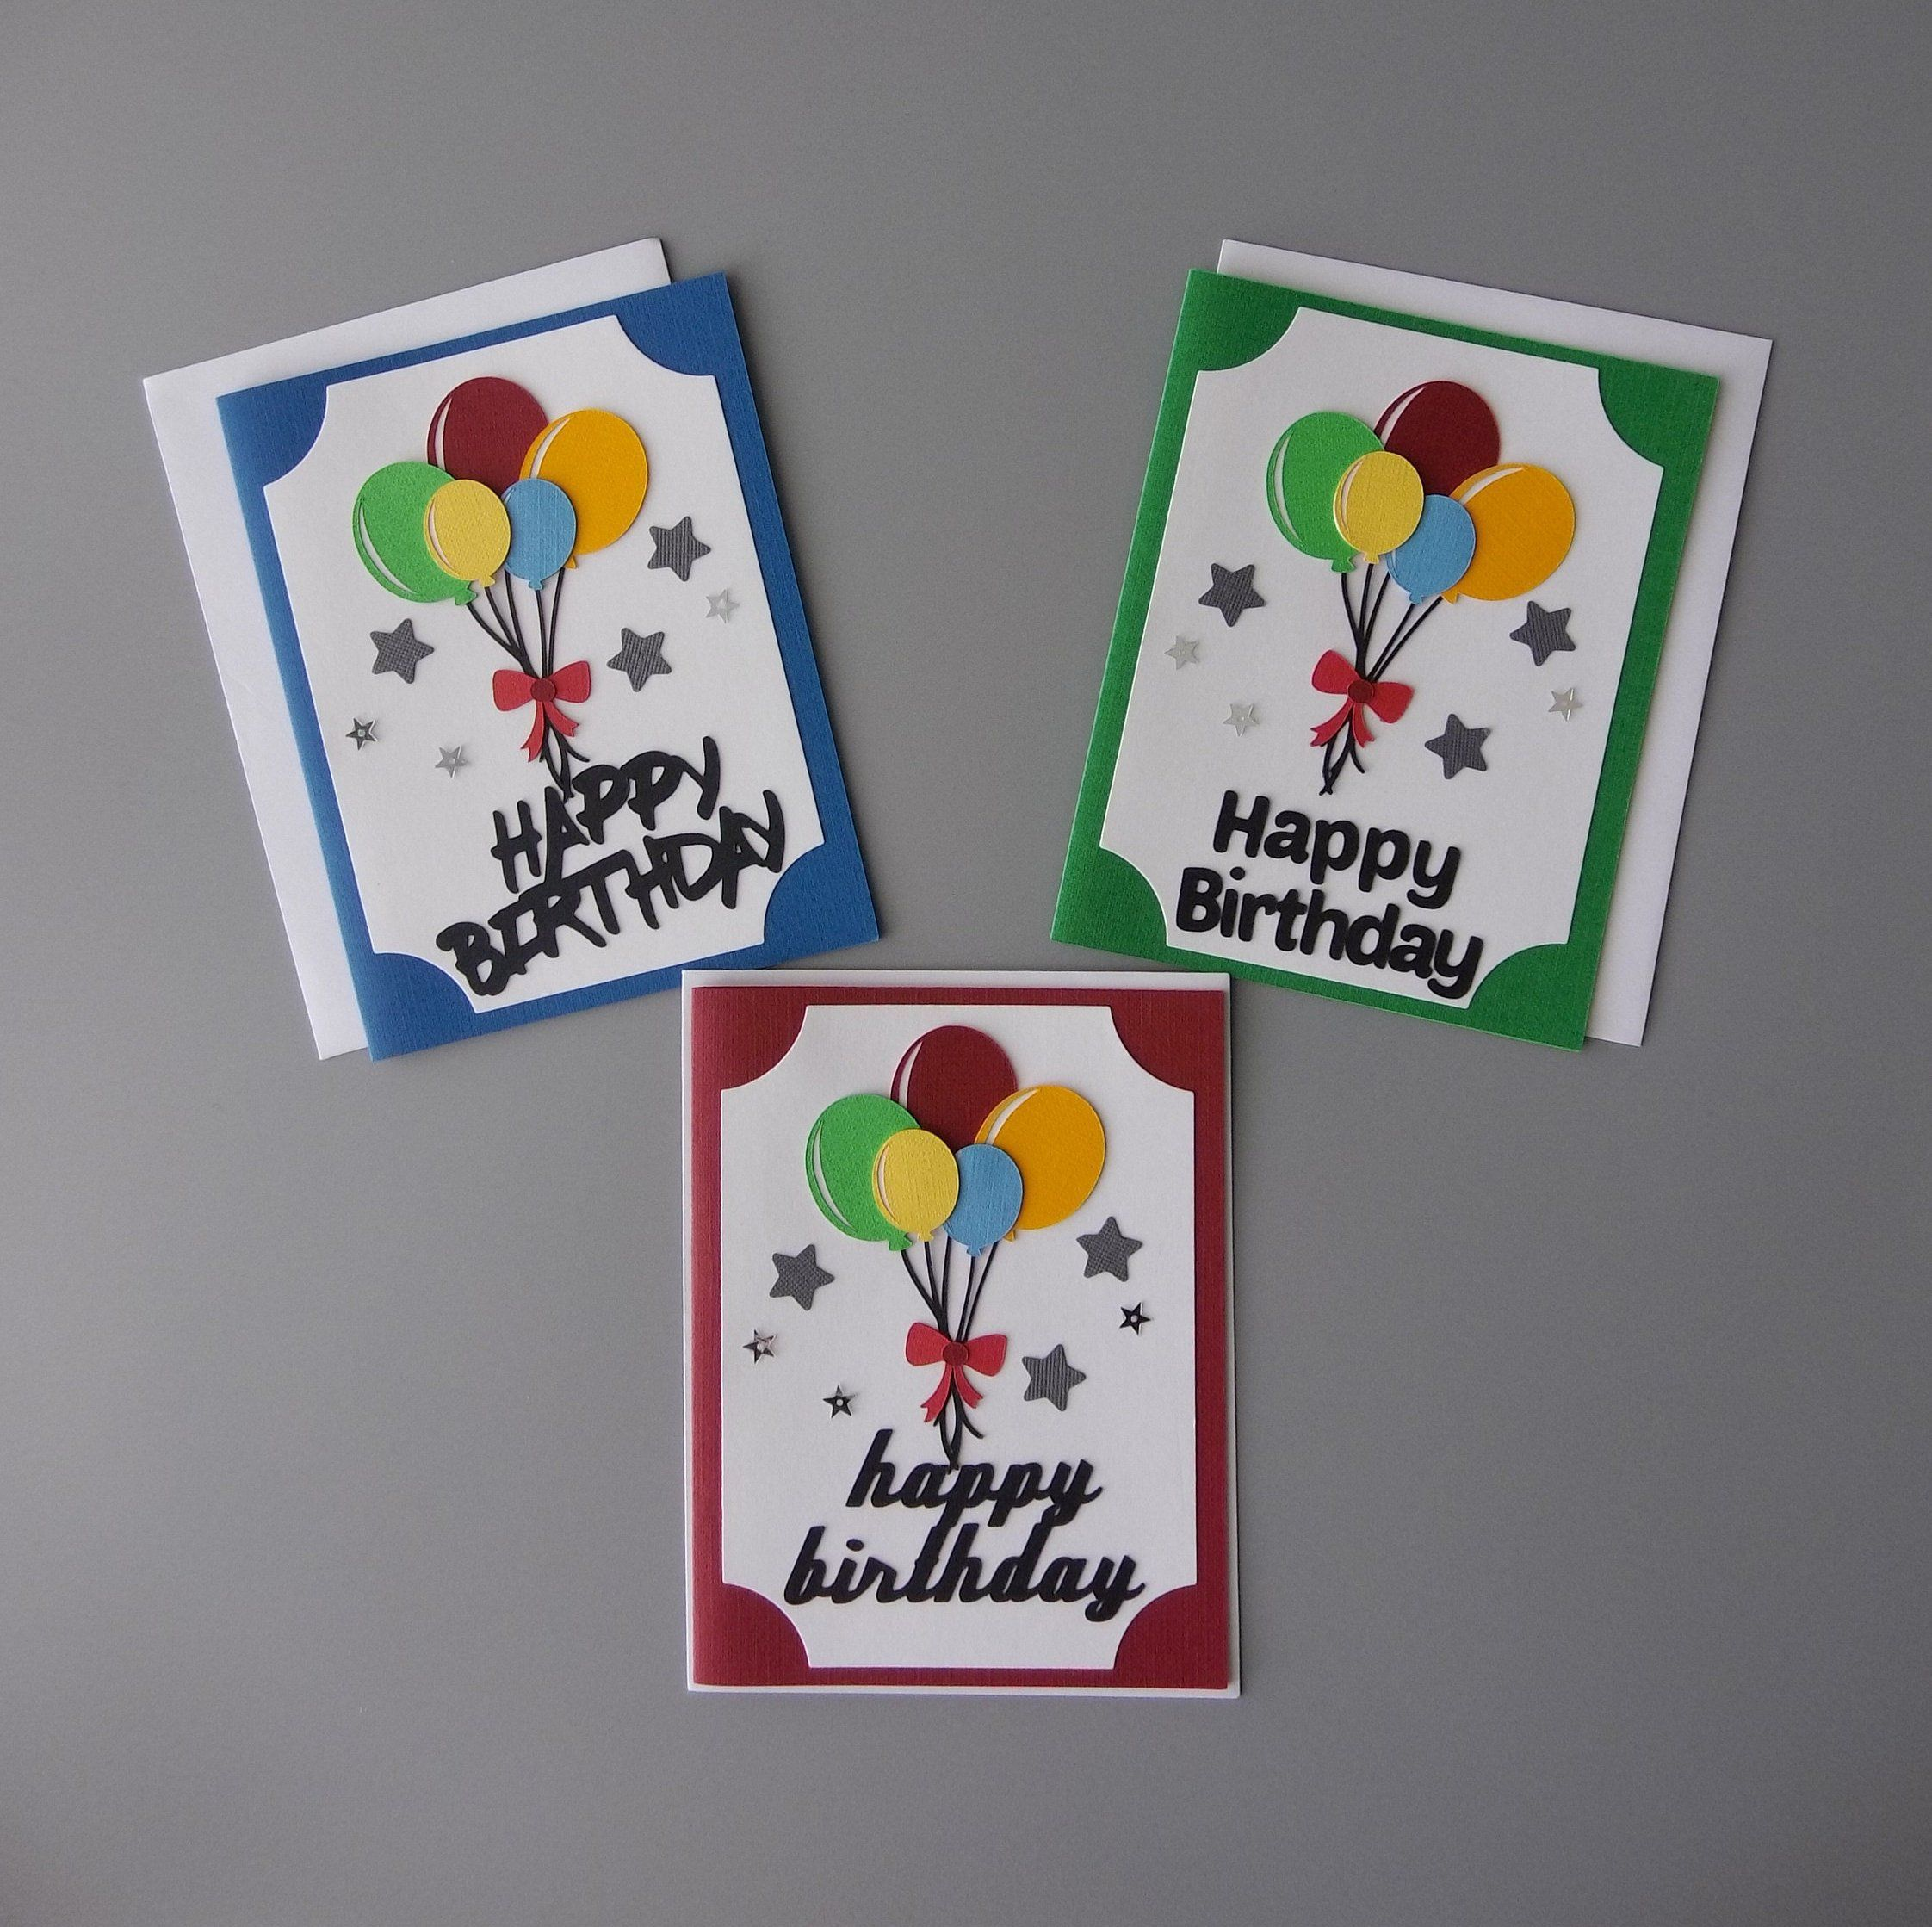 Birthday card with balloons set friend birthday card